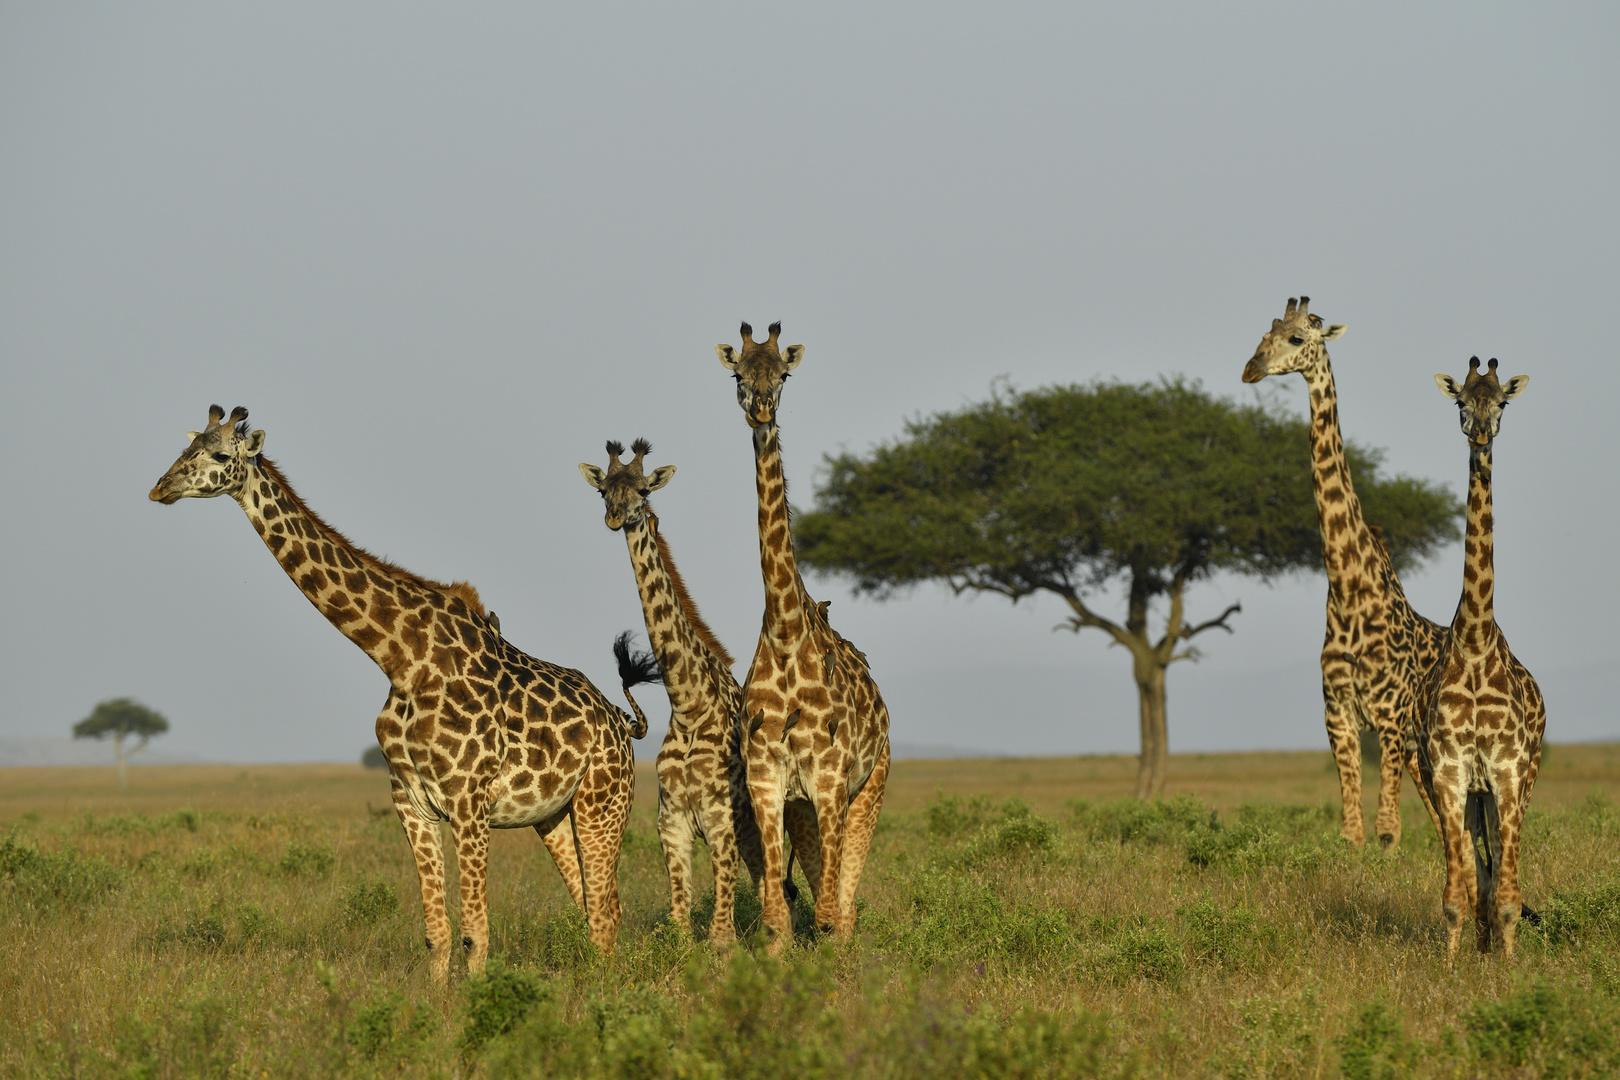 the five long necks